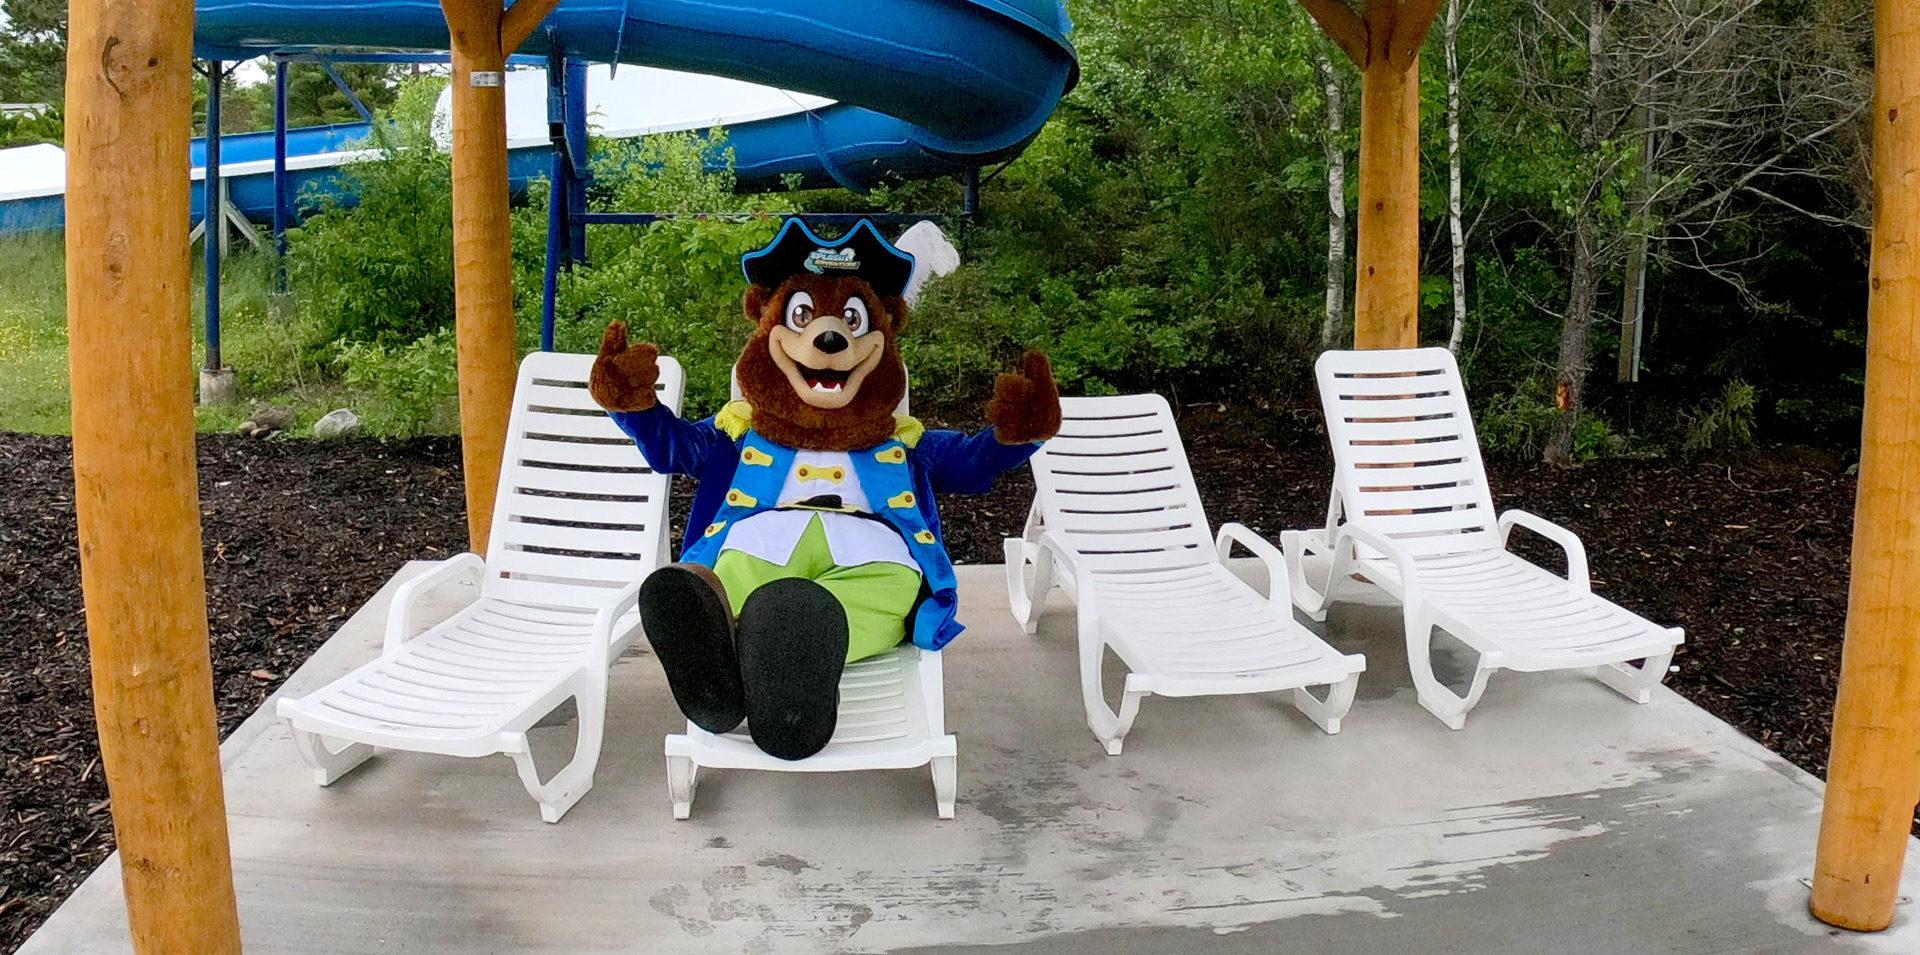 Captain Bear lounge